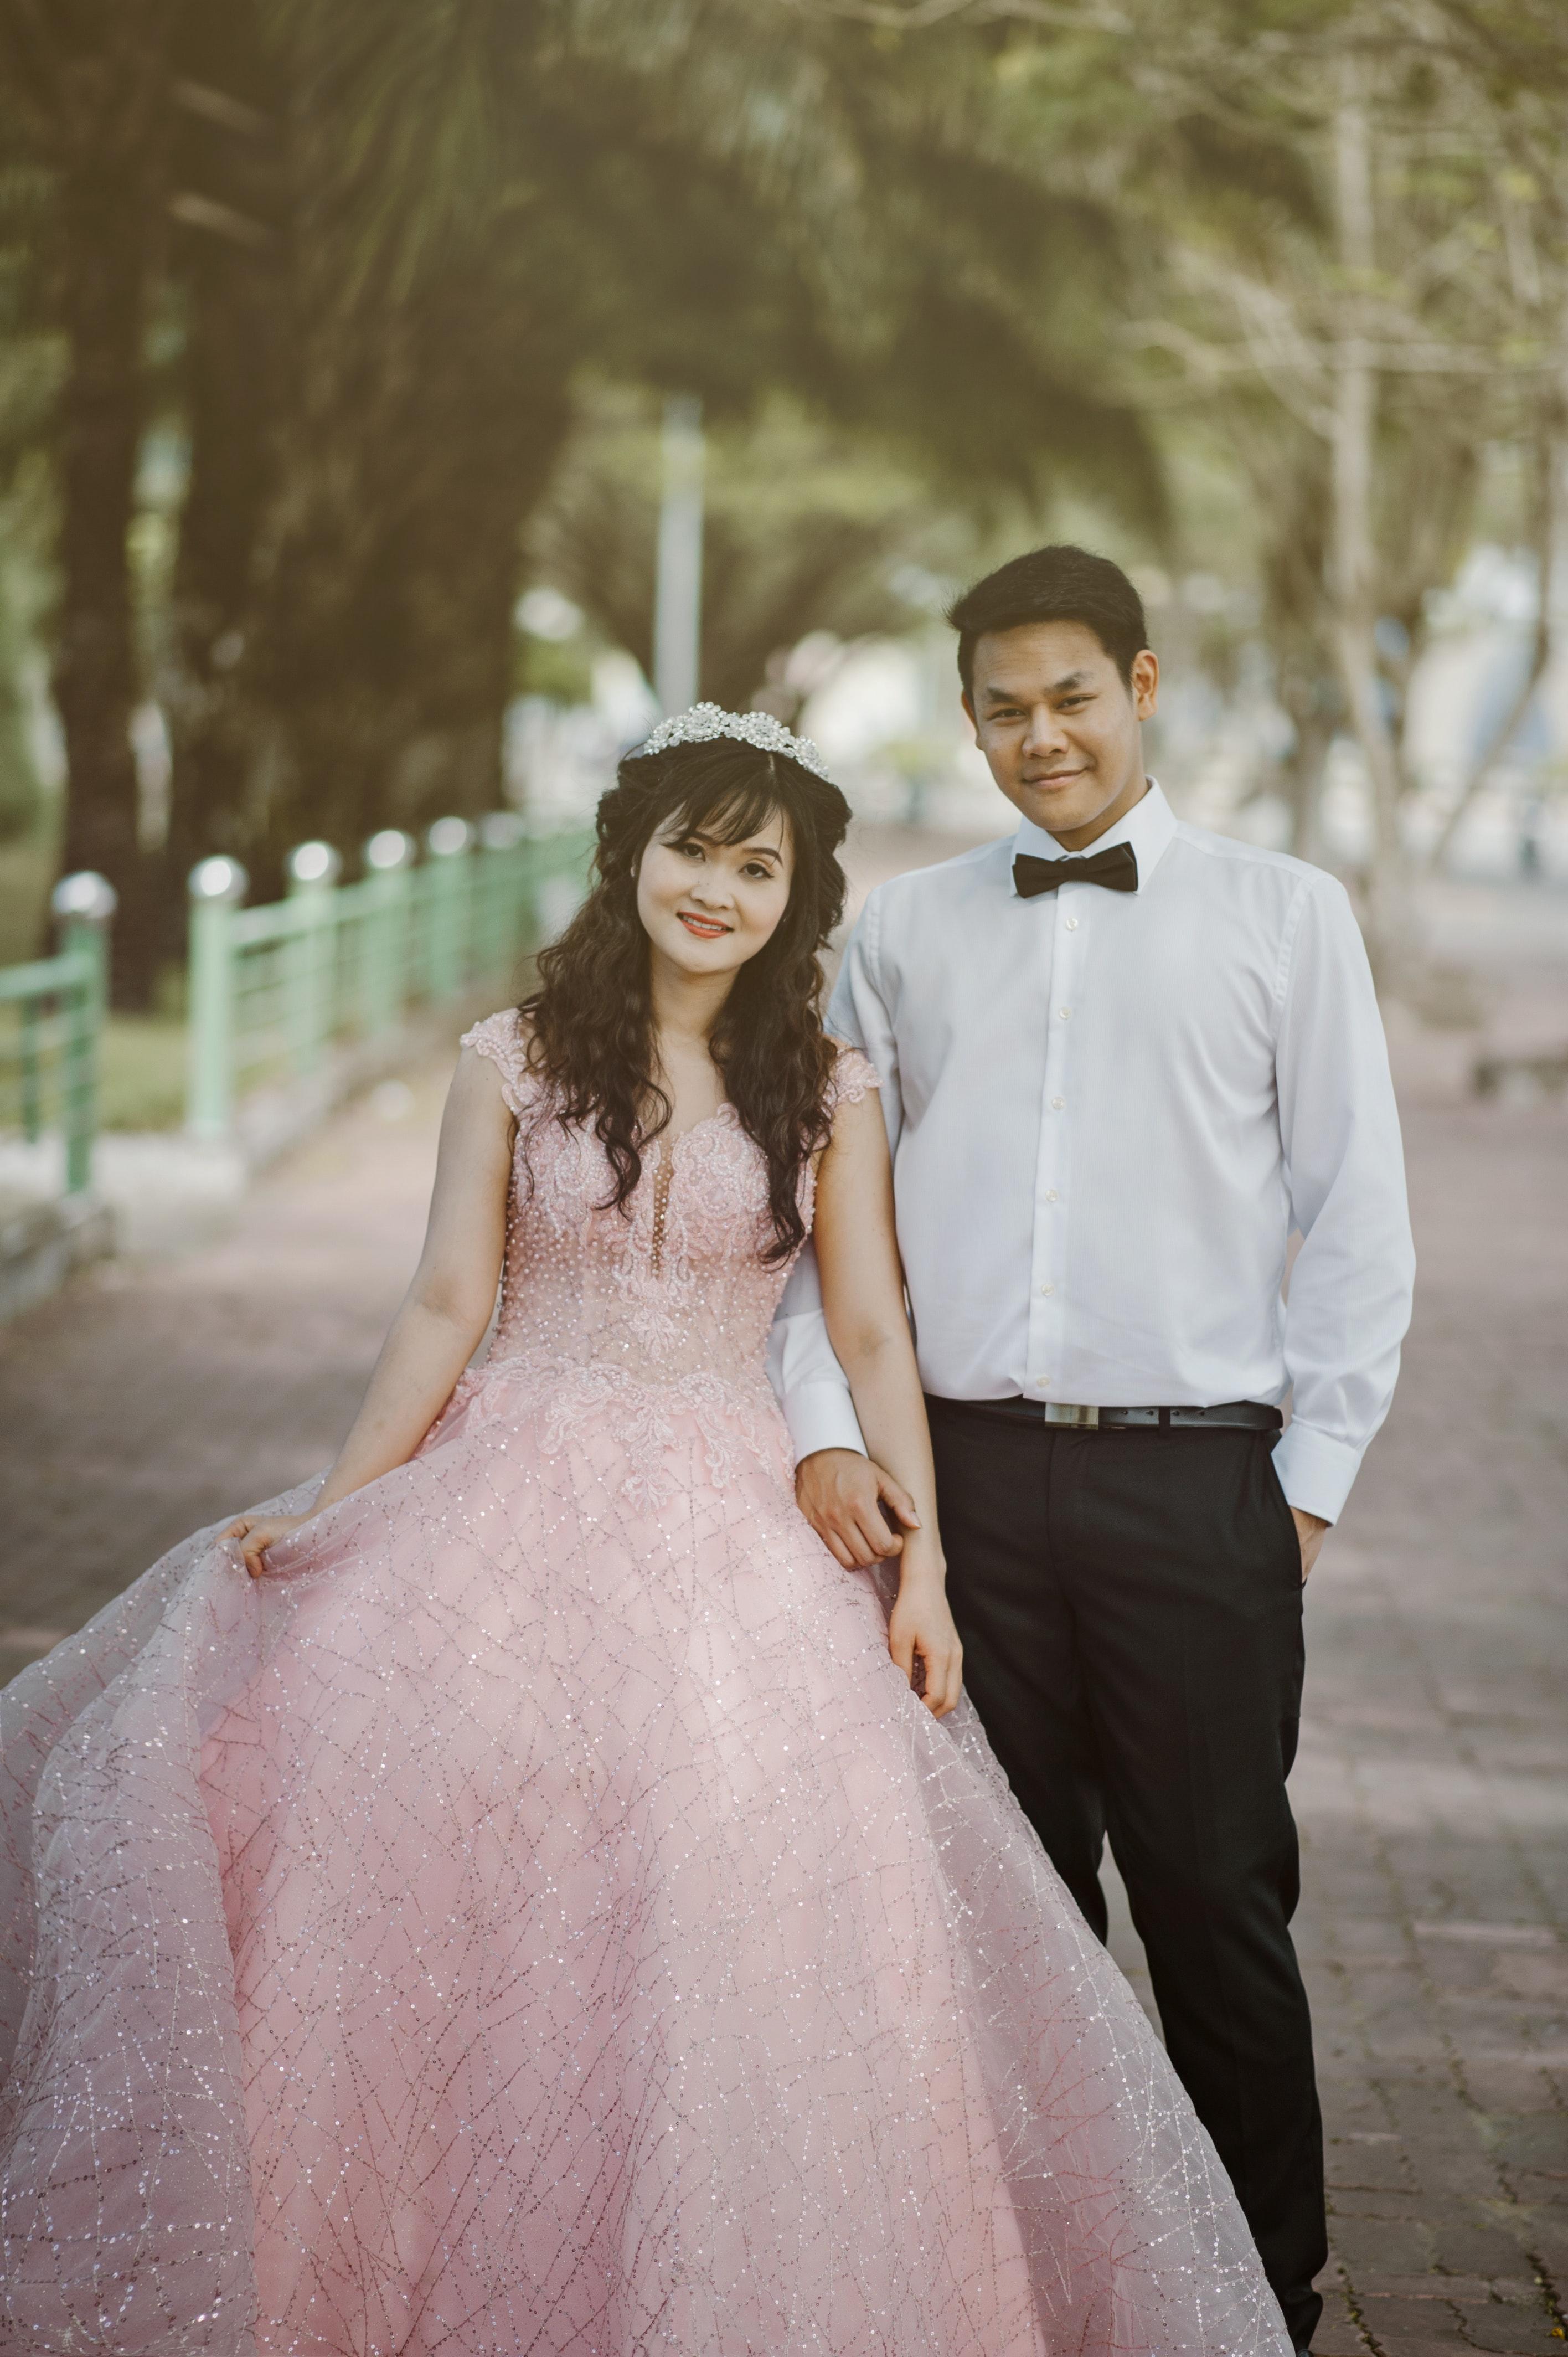 Free photo woman wearing pink wedding gown standing next to man woman wearing pink wedding gown standing next to man wearing white dress shirt photo junglespirit Choice Image